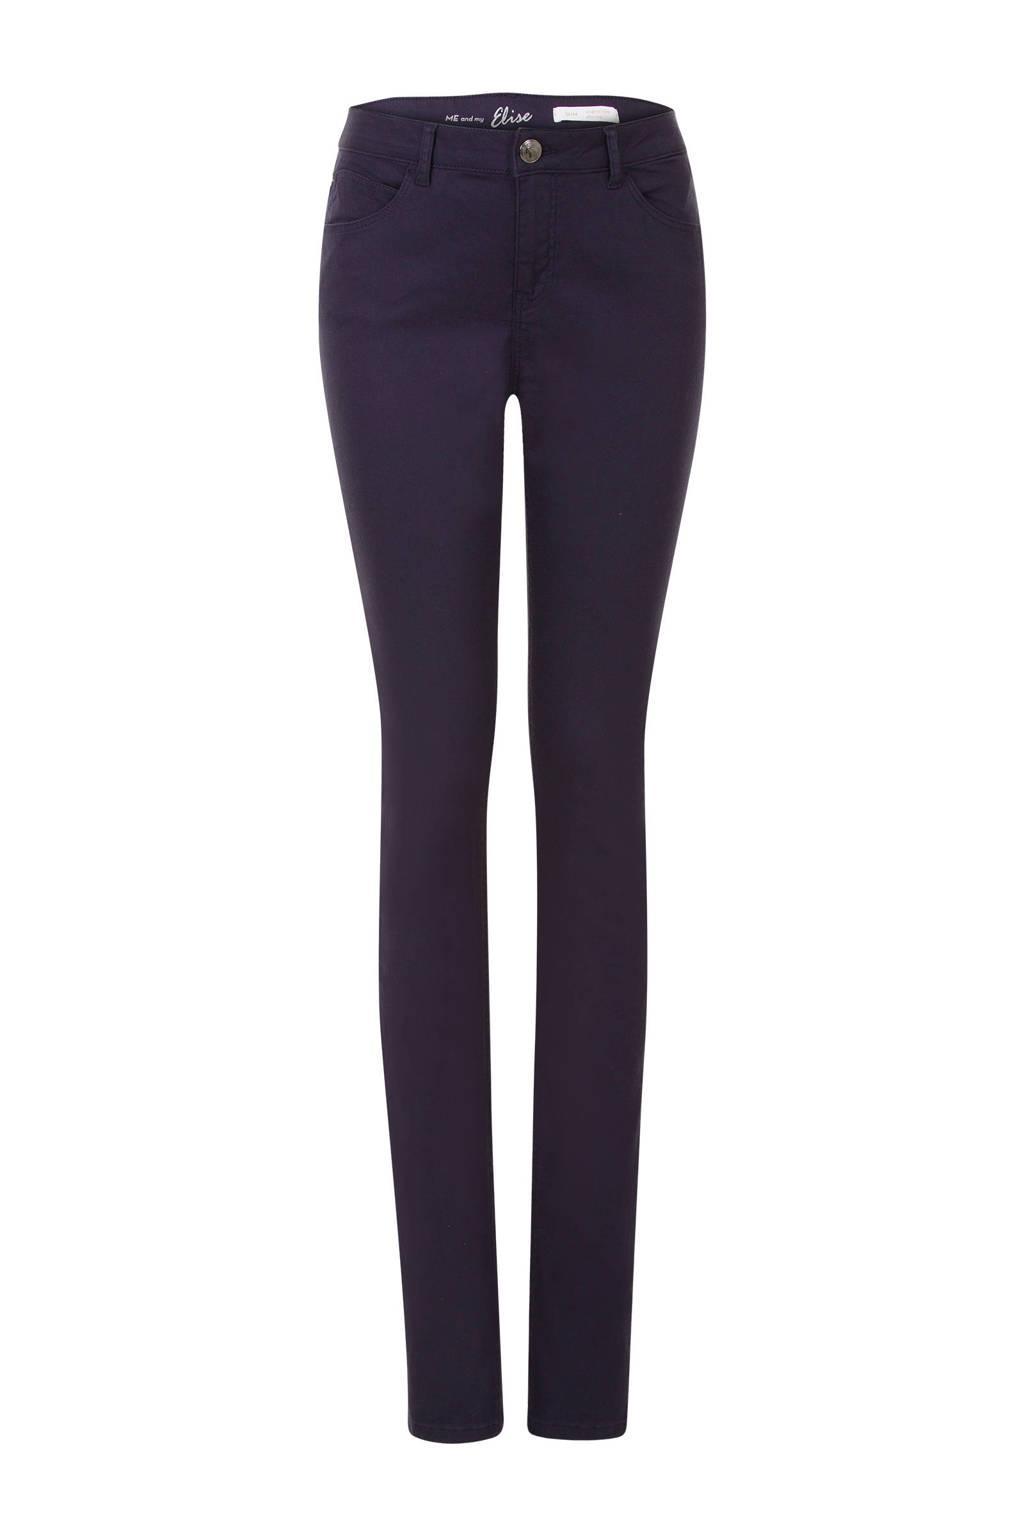 Miss Etam Lang slim fit jeans 36 inch, Donkerblauw